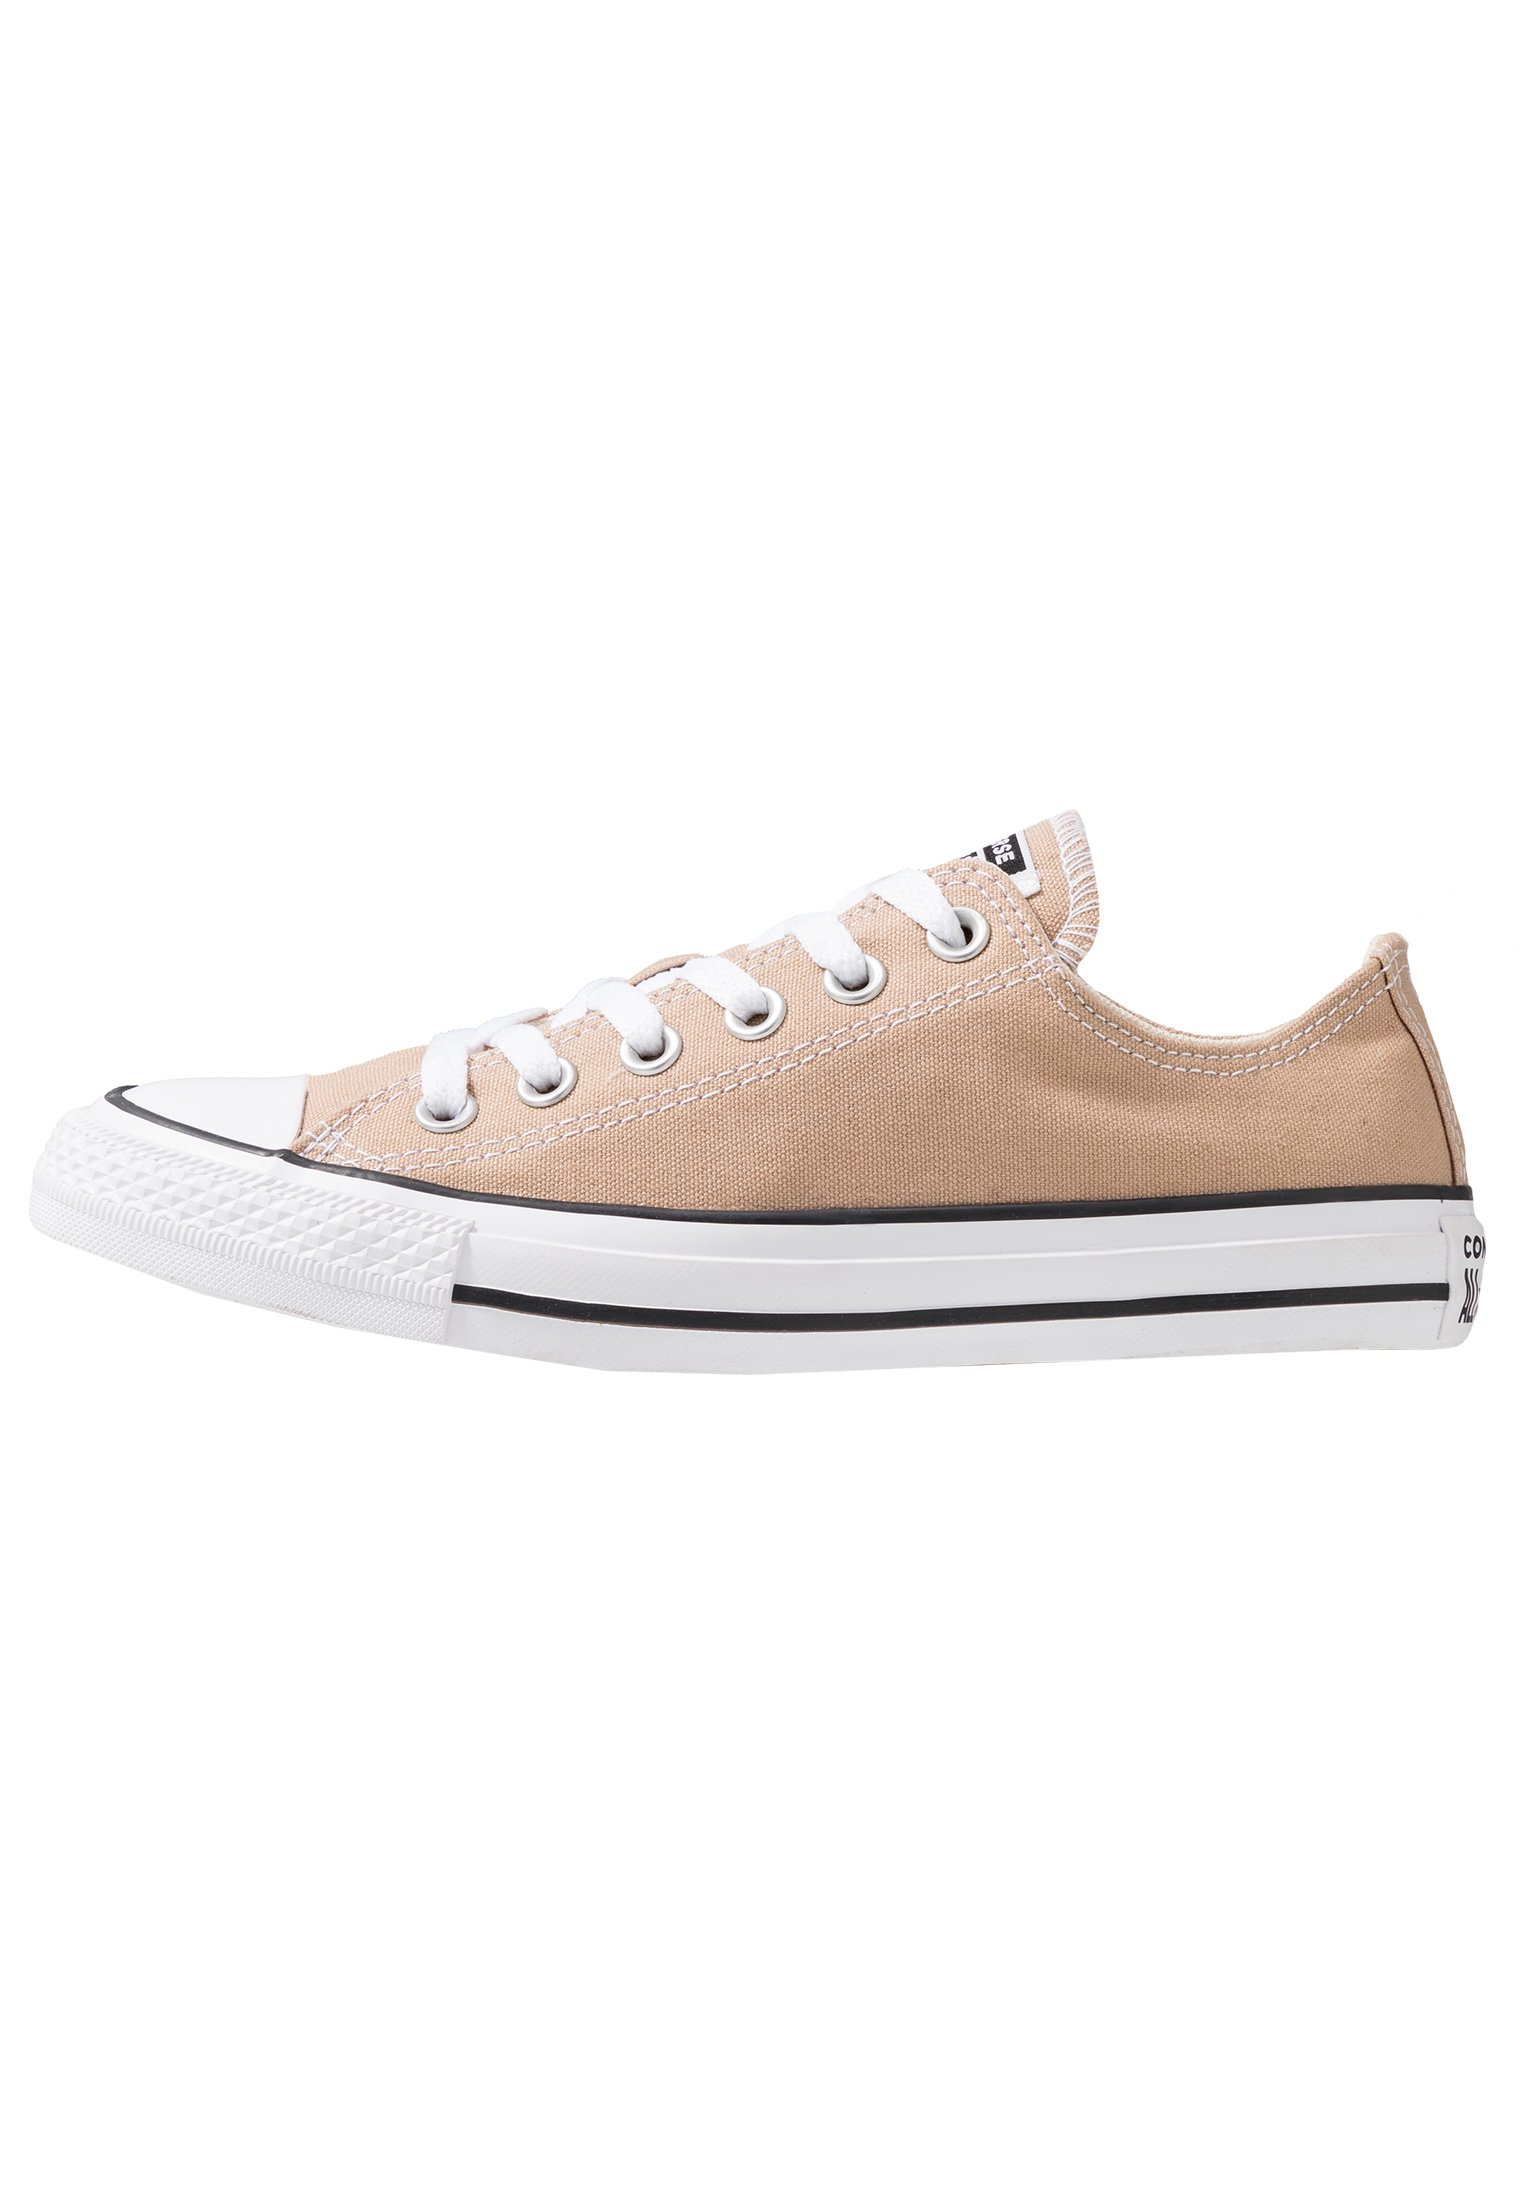 Converse CHUCK TAYLOR ALL STAR SEASONAL COLOR Sneaker low